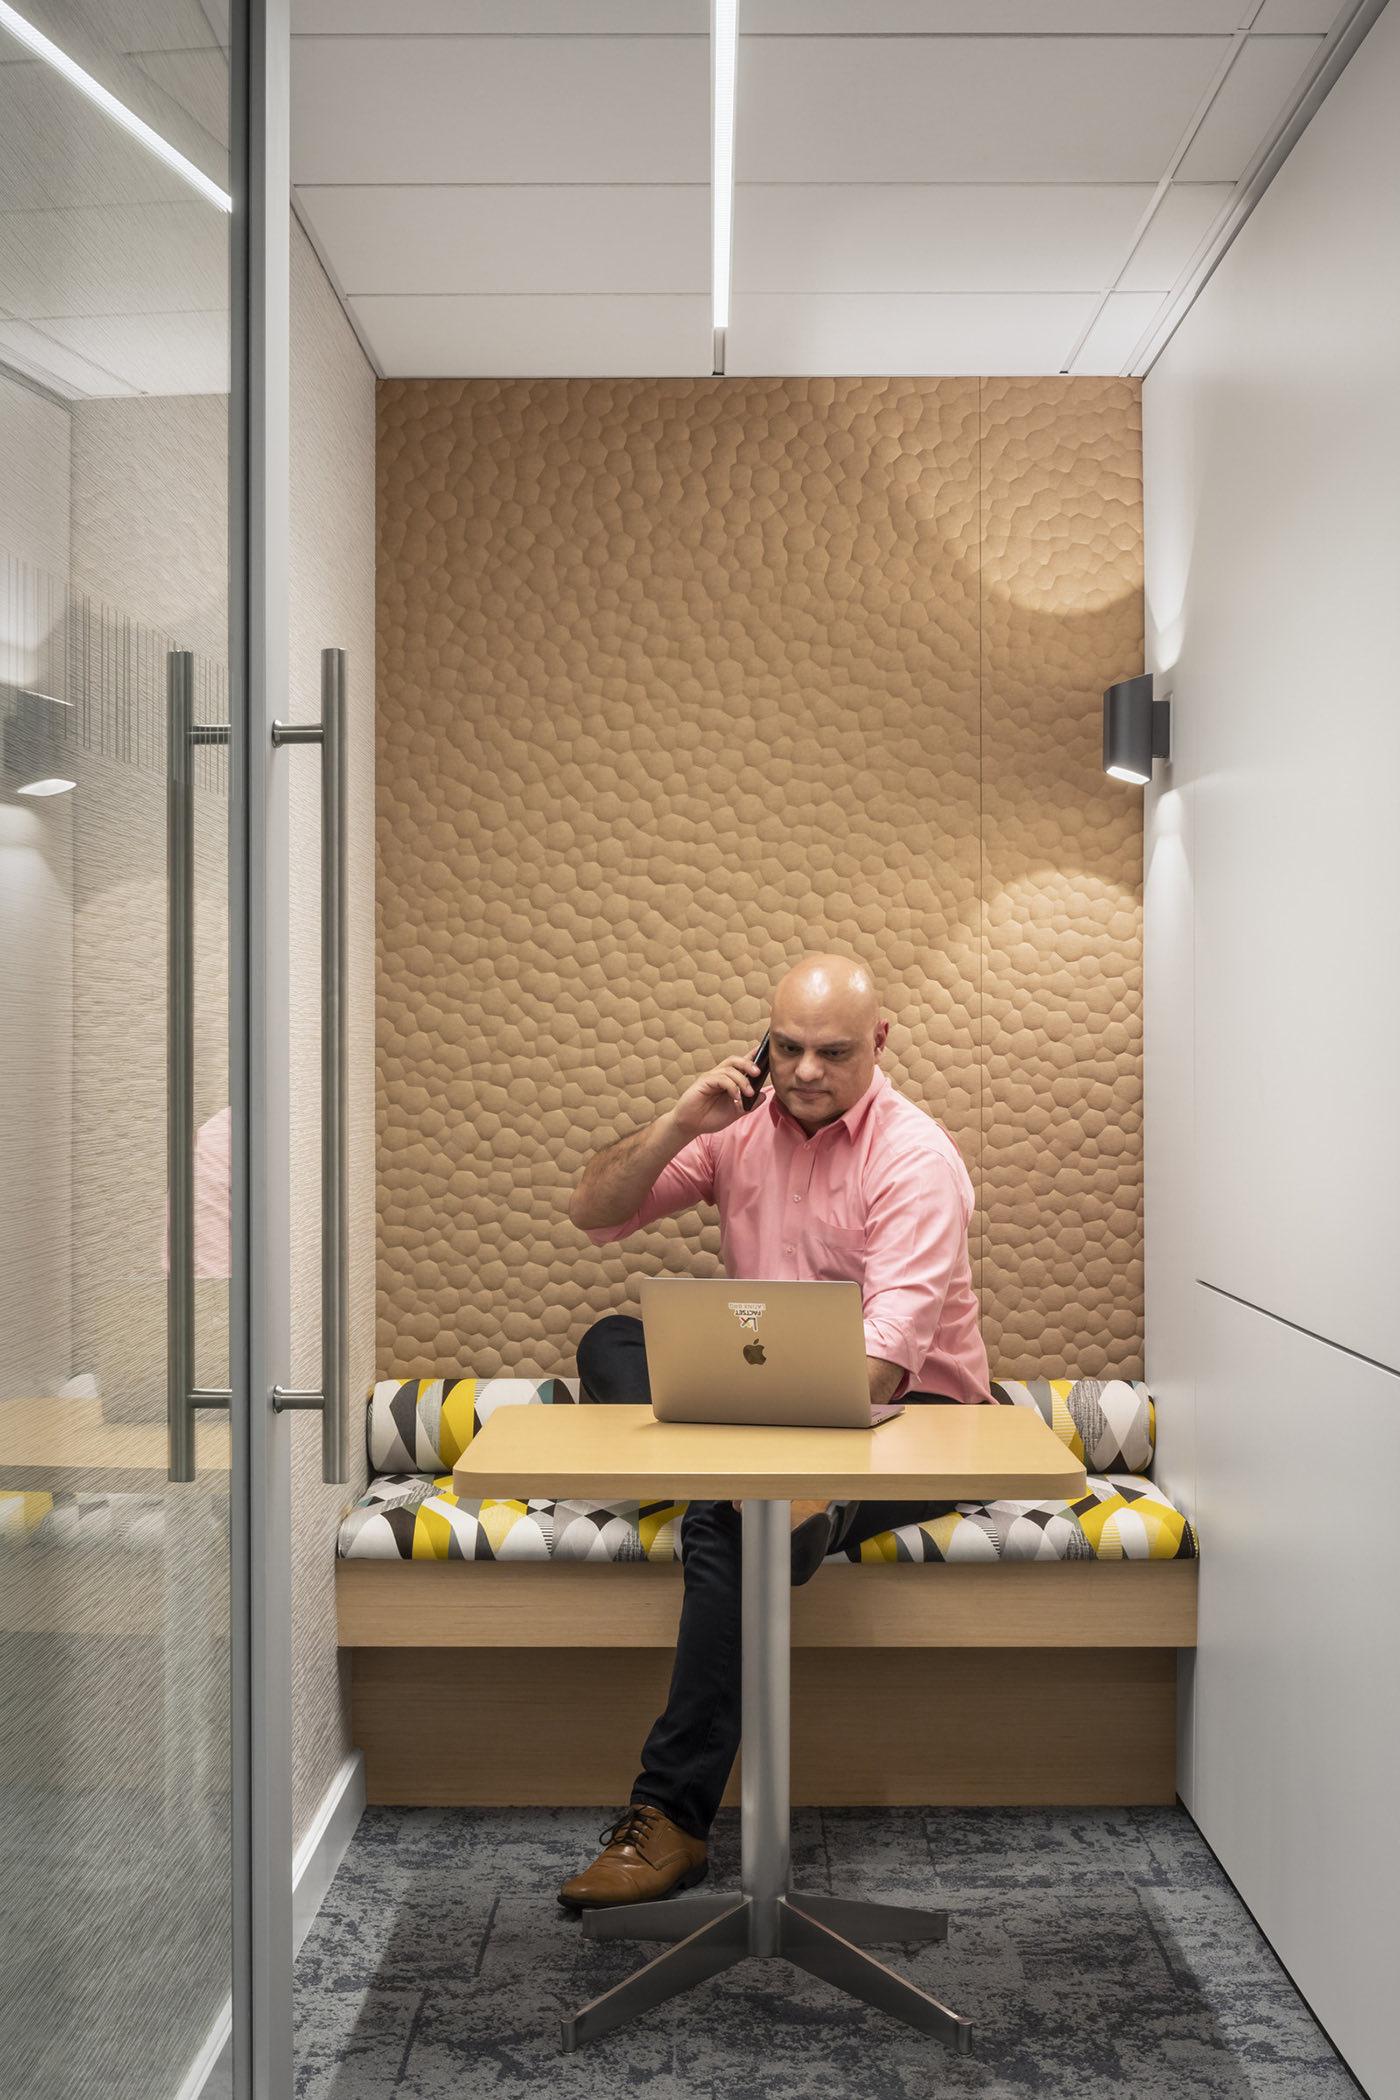 factset-norwalk-office-11